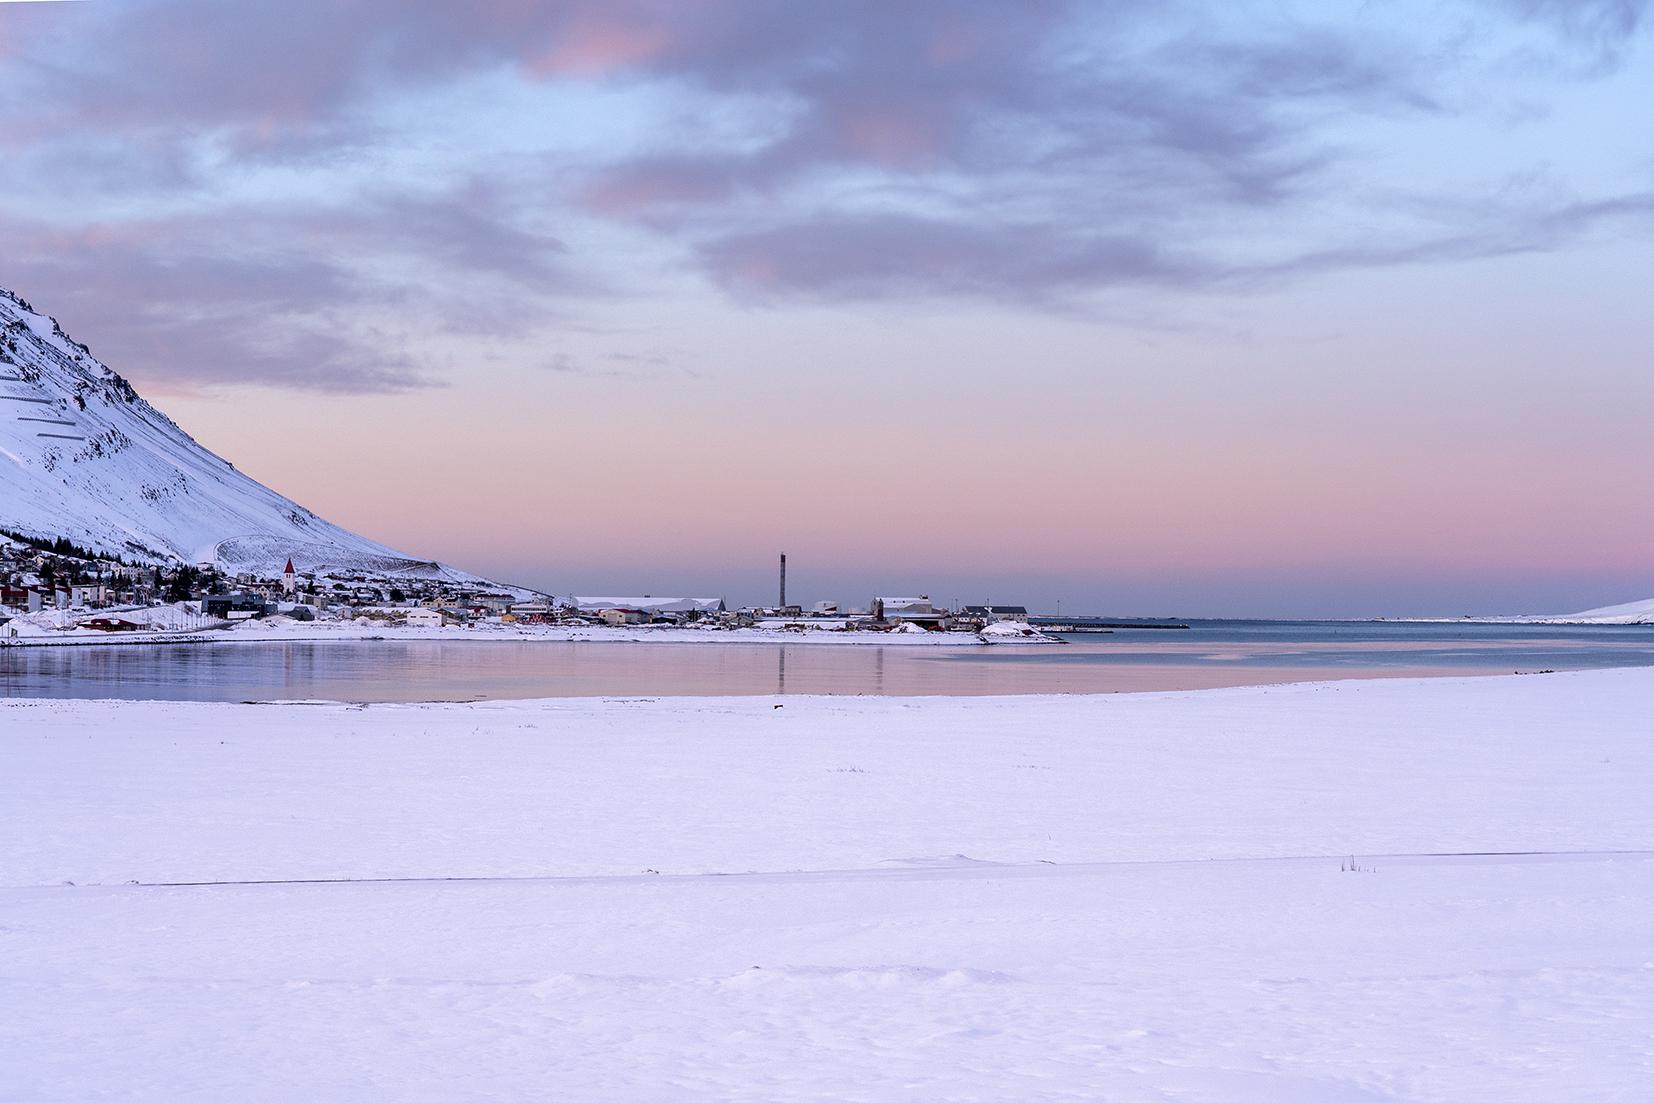 Tröllaskagi Siglufjörður coucher de soleil ciel rose mer Islande du Nord